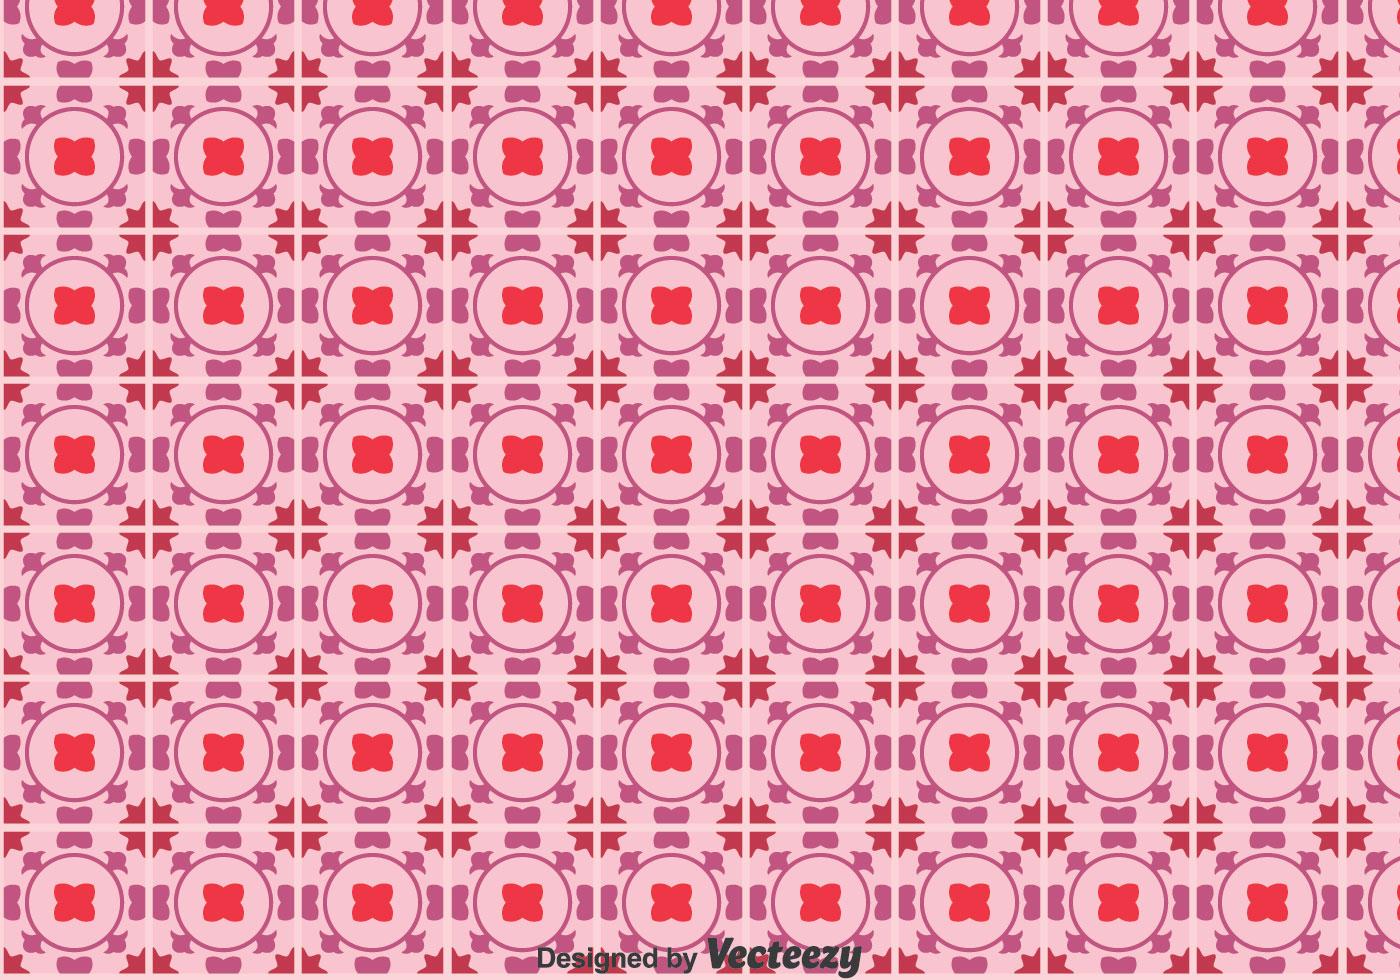 talavera purple tiles seamless pattern download free